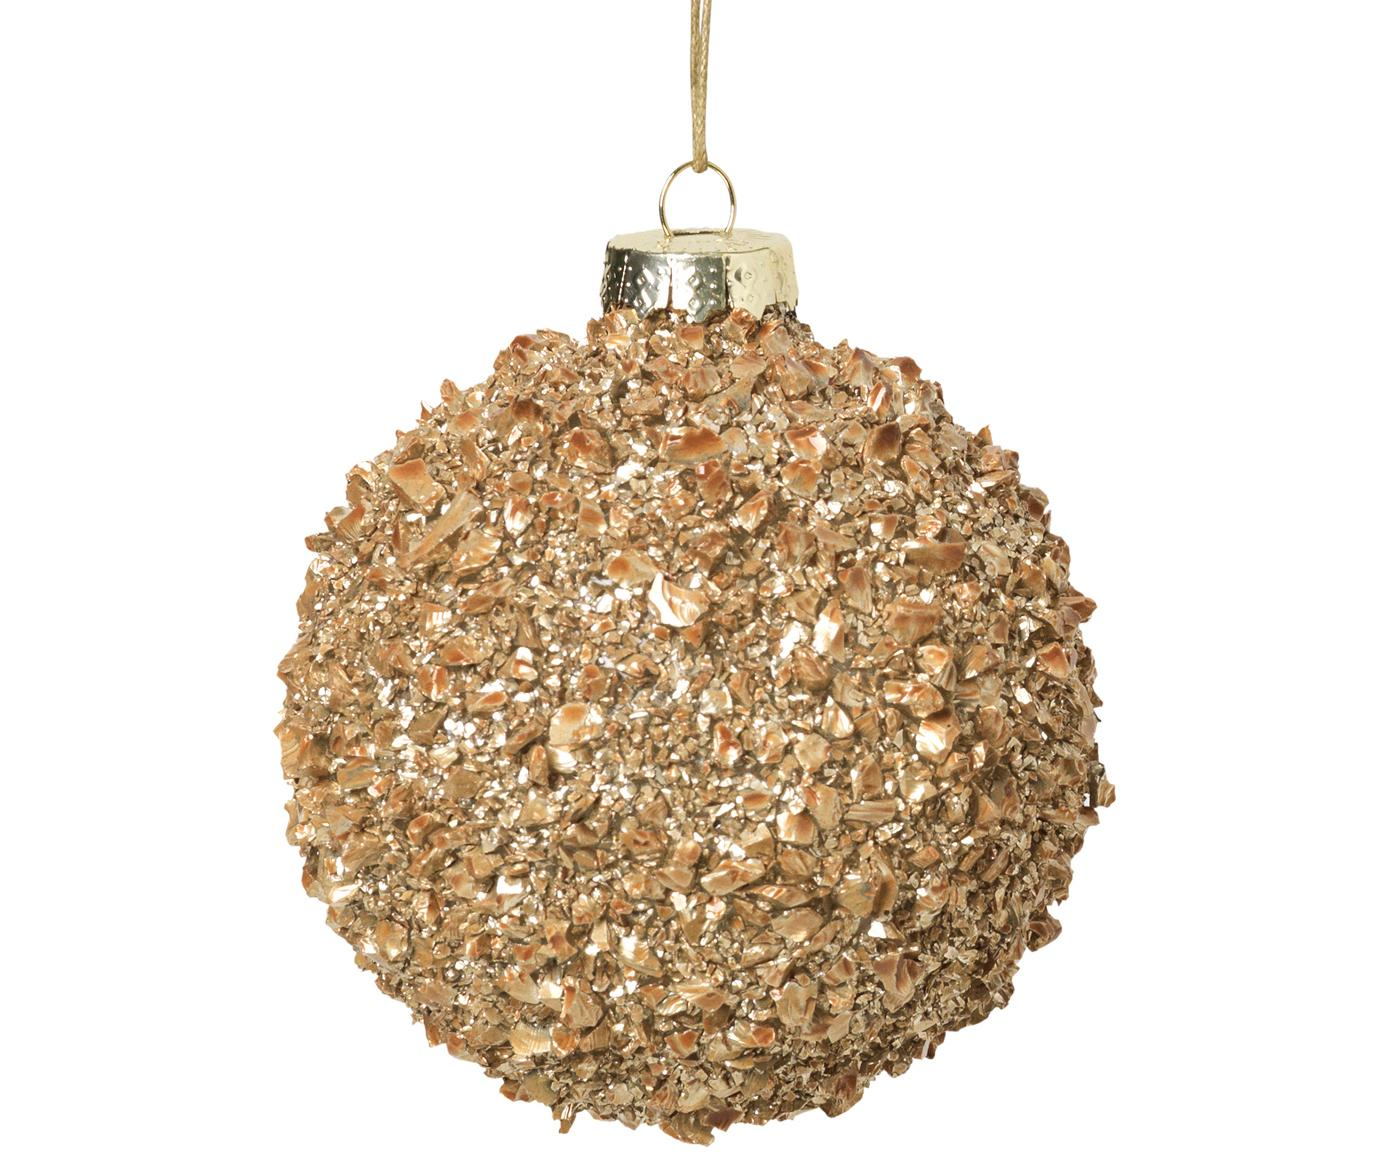 Weihnachtskugeln Cinna Ø8cm, 3Stück, Glas, Metall, Goldfarben, Ø 8 cm